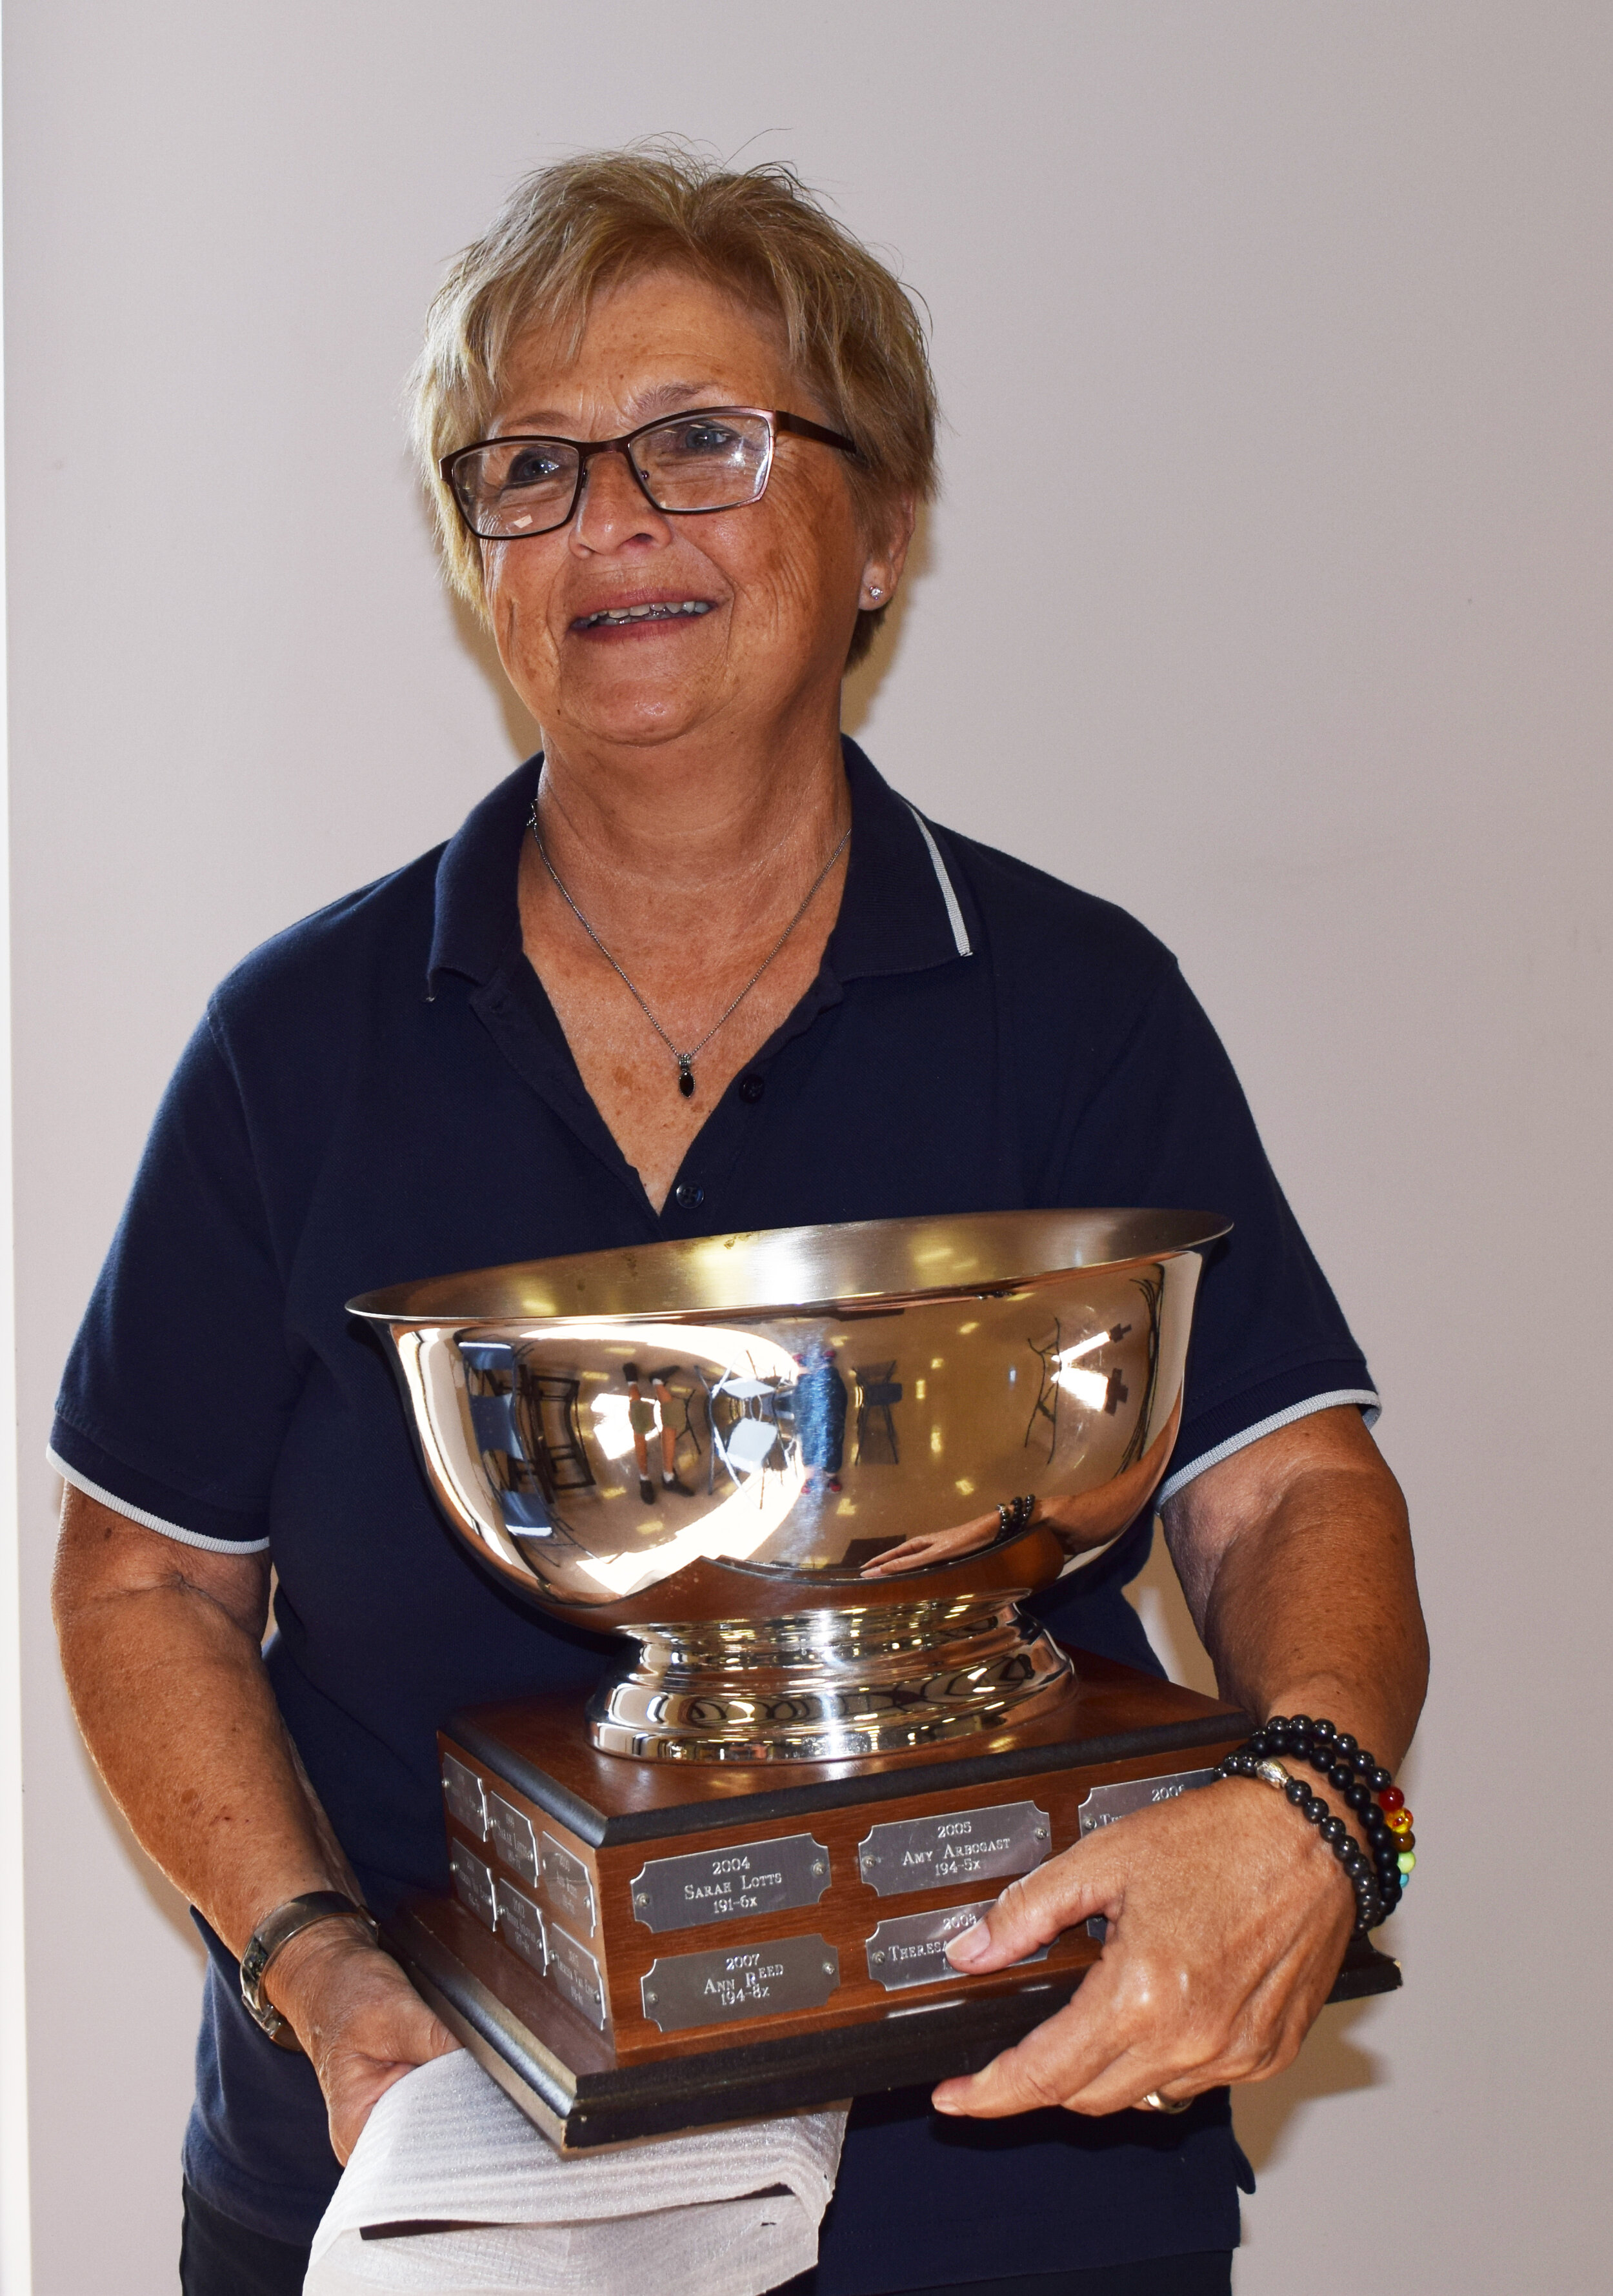 Ann Reed - Aggregate B - Women's Rifle Championship Winner